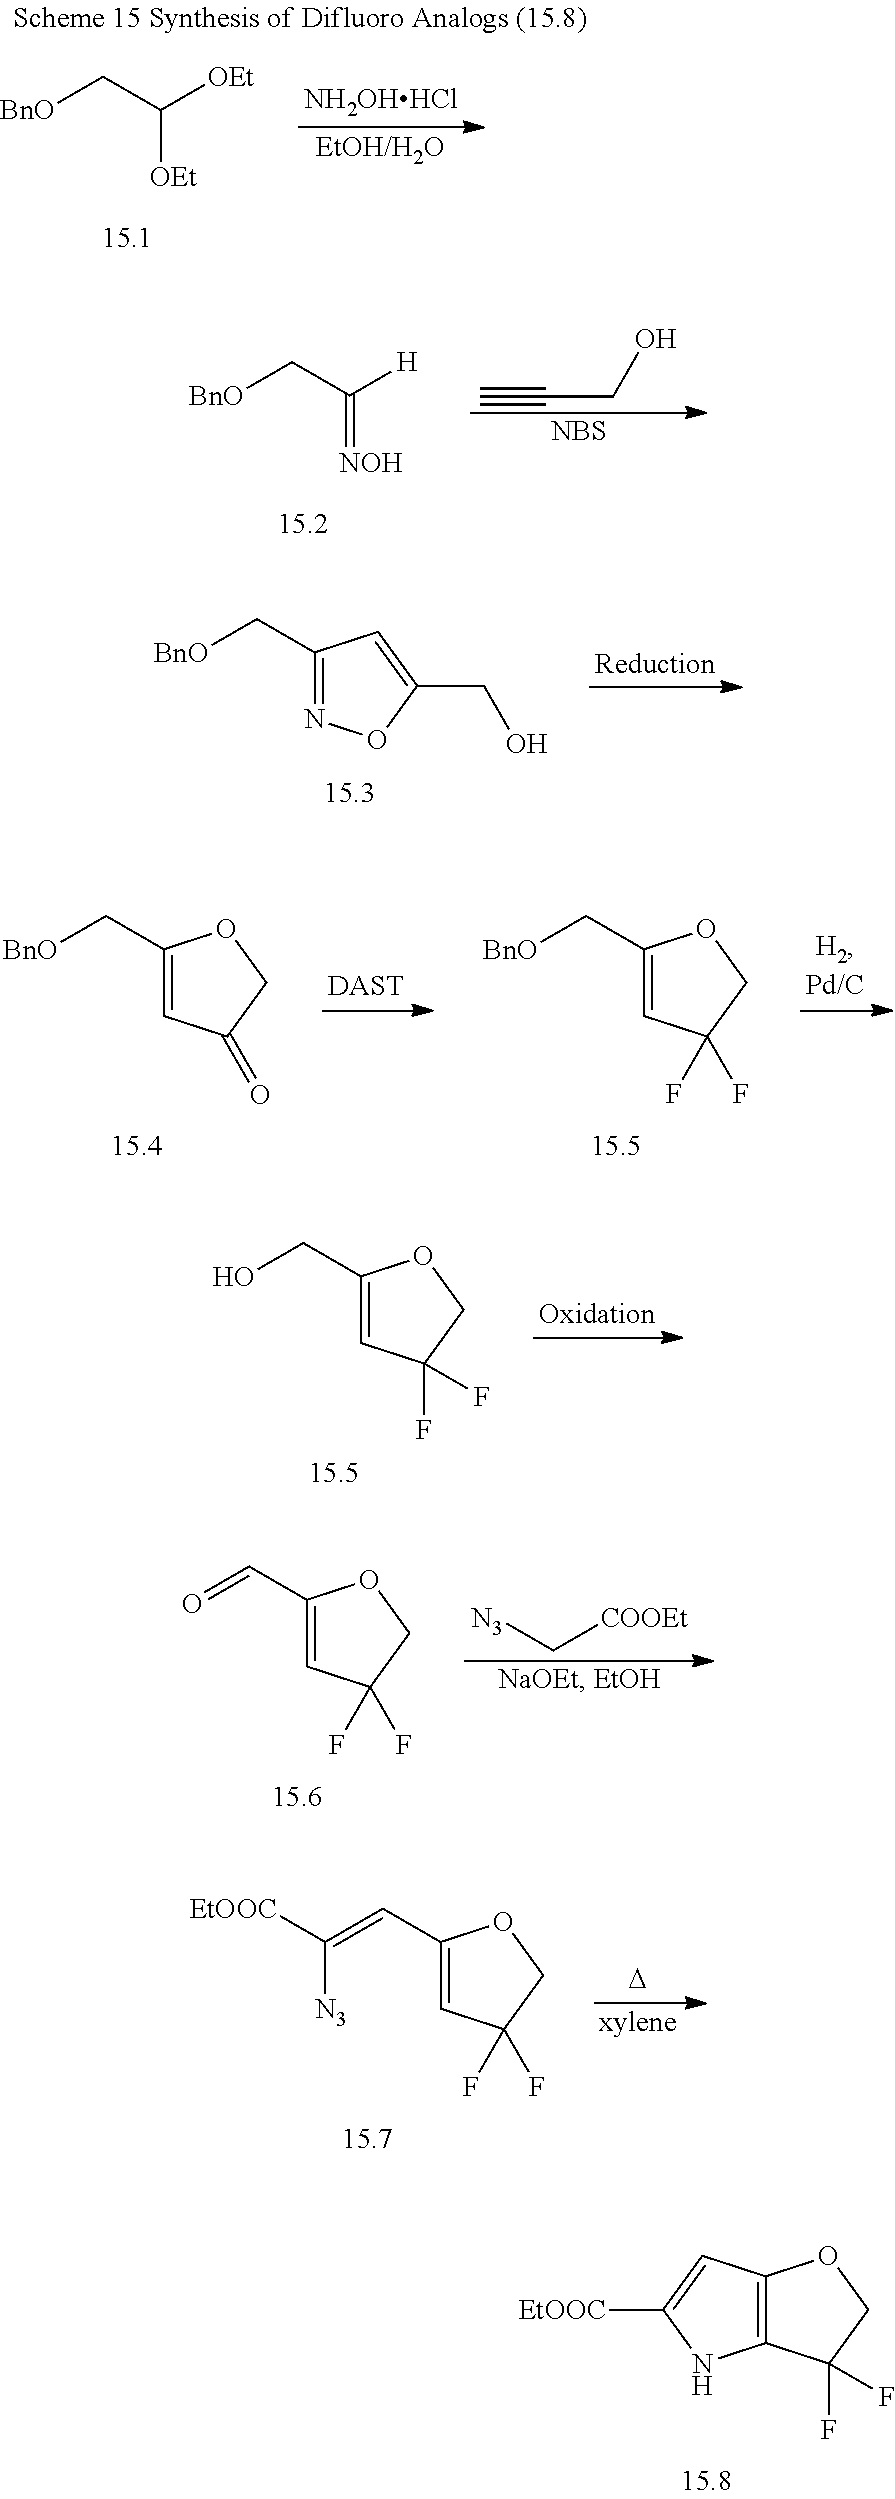 us7902252b2 inhibitors of d amino acid oxidase patents 1950 International Truck Wiring Diagram figure us07902252 20110308 c00079